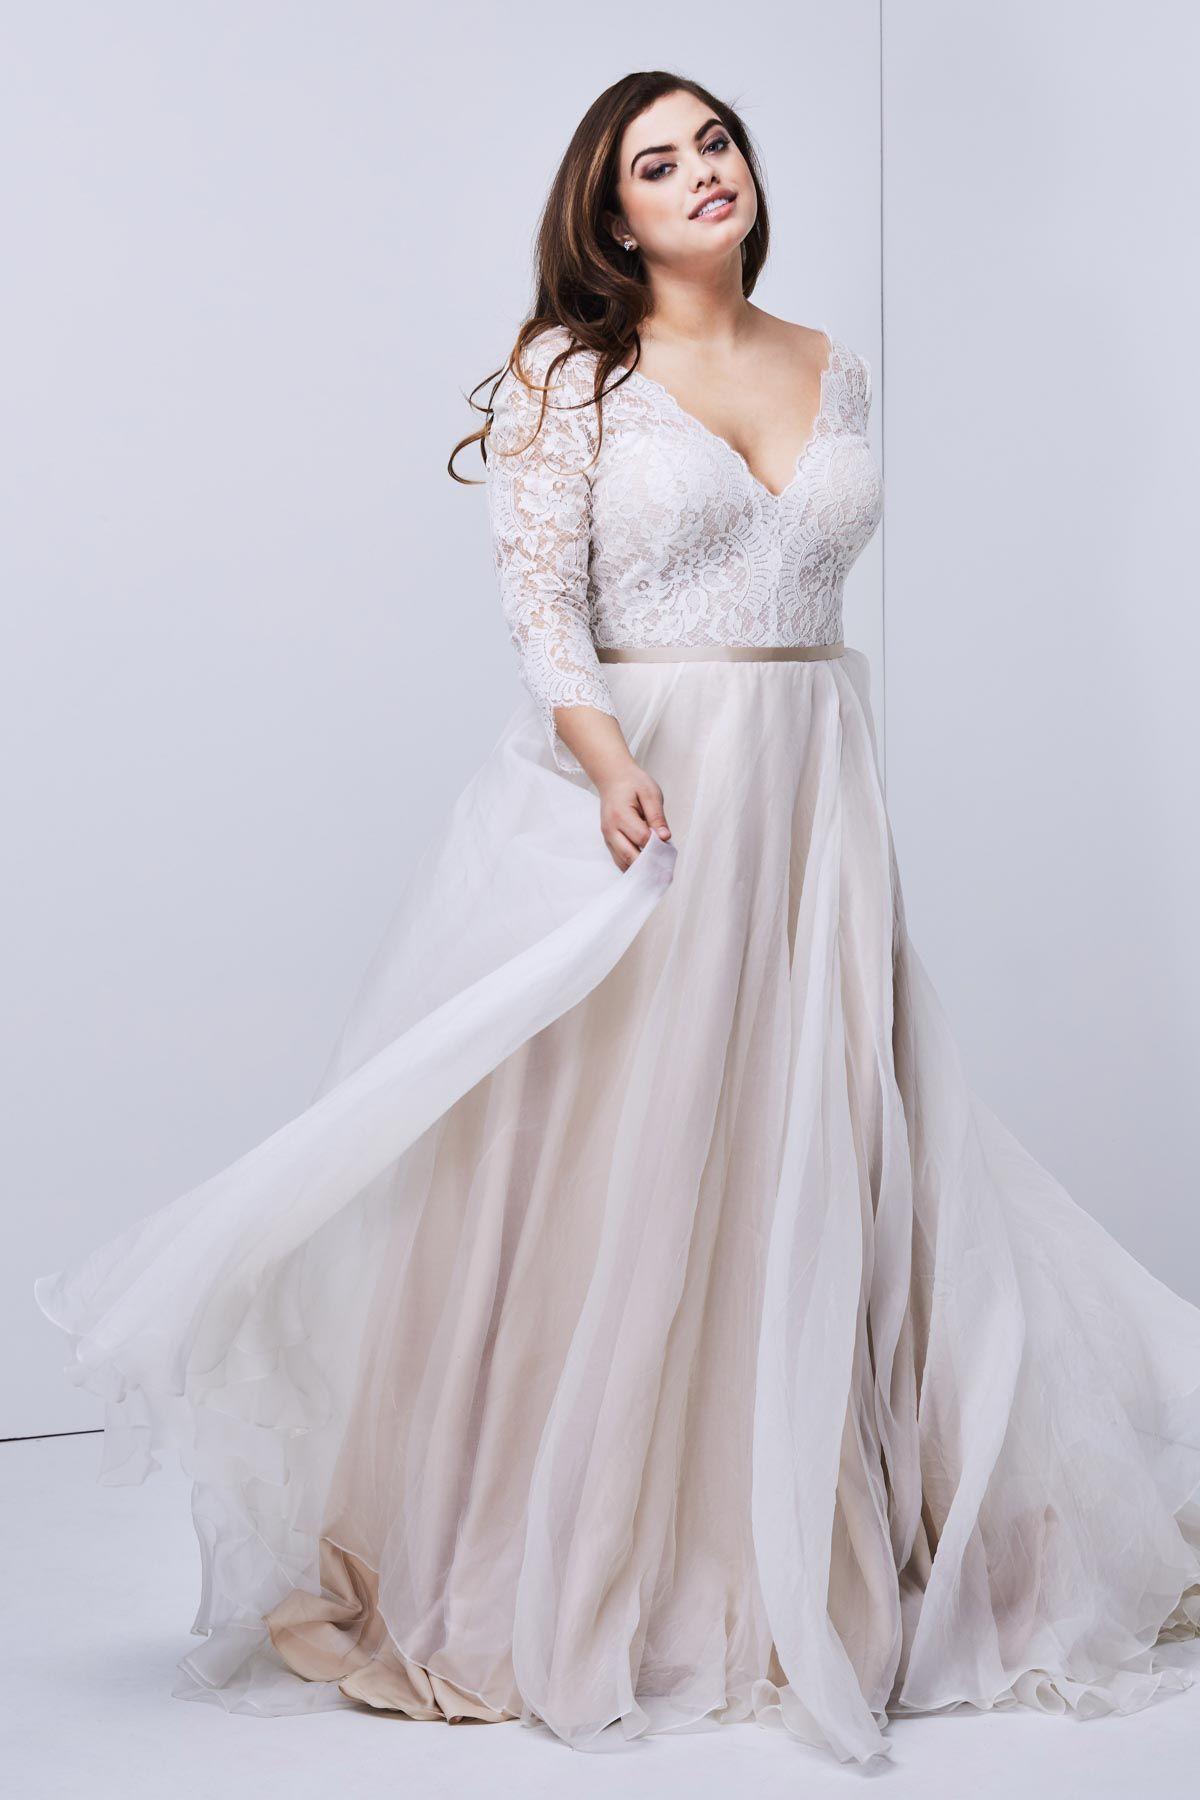 Shiloh 3004b Watters Brides Watters Plus Size Wedding Gowns Plus Wedding Dresses Perfect Wedding Dress [ 1800 x 1200 Pixel ]